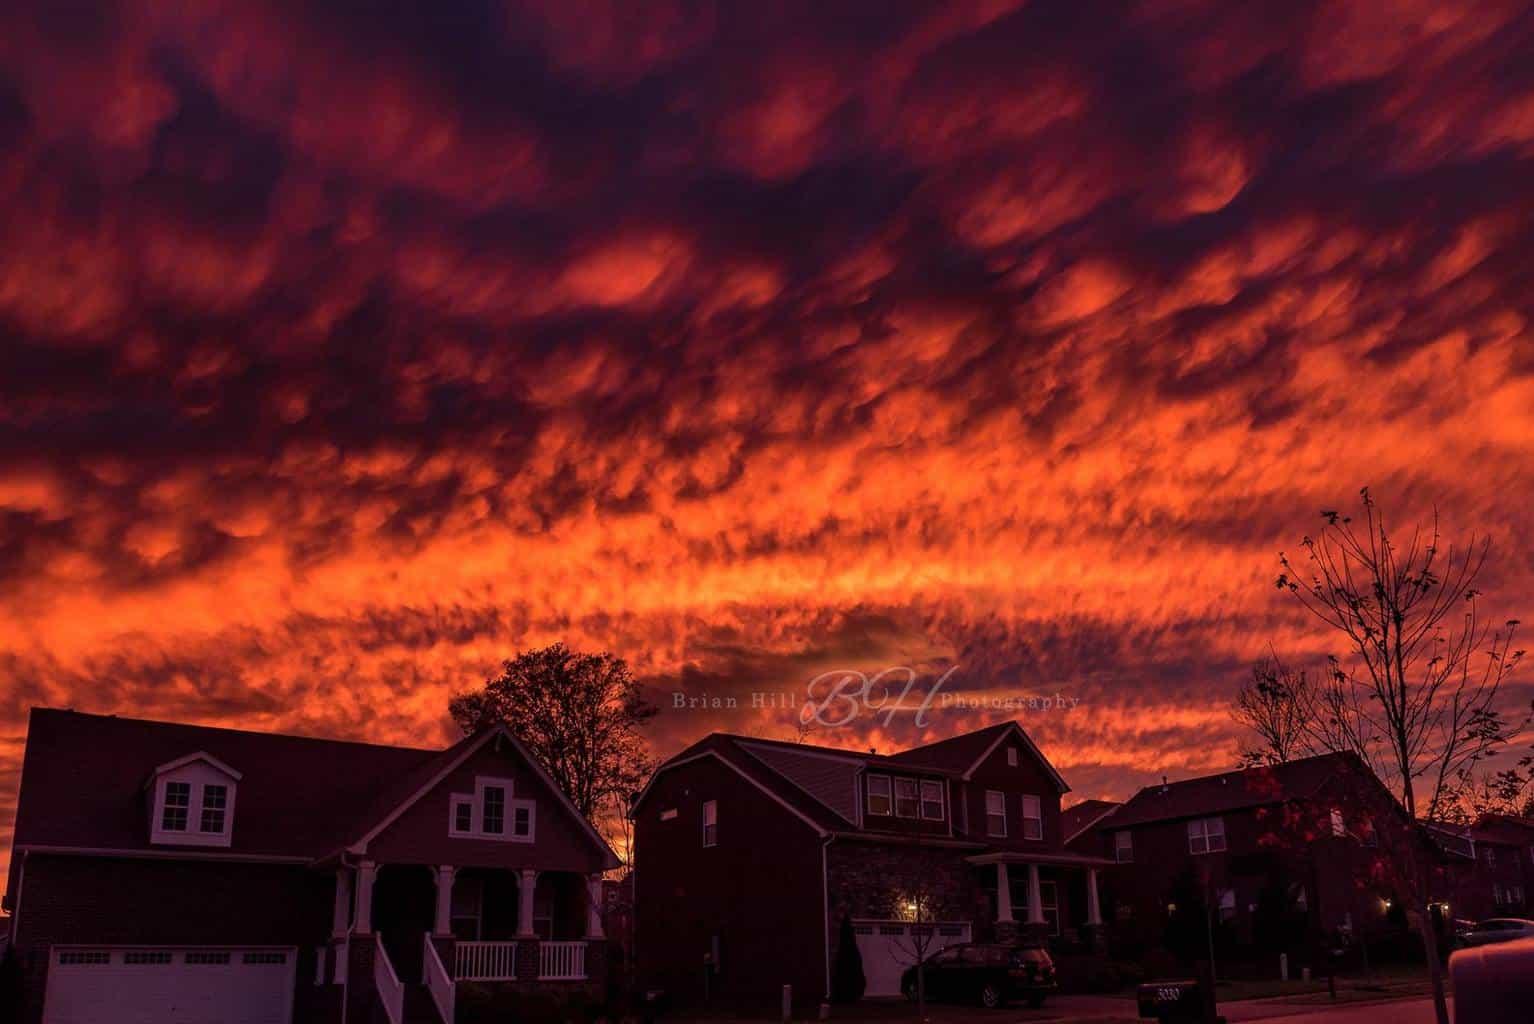 Nolensville TN (Just outside Nashville) 11-18-2015 we don't get many like this. It was something else.